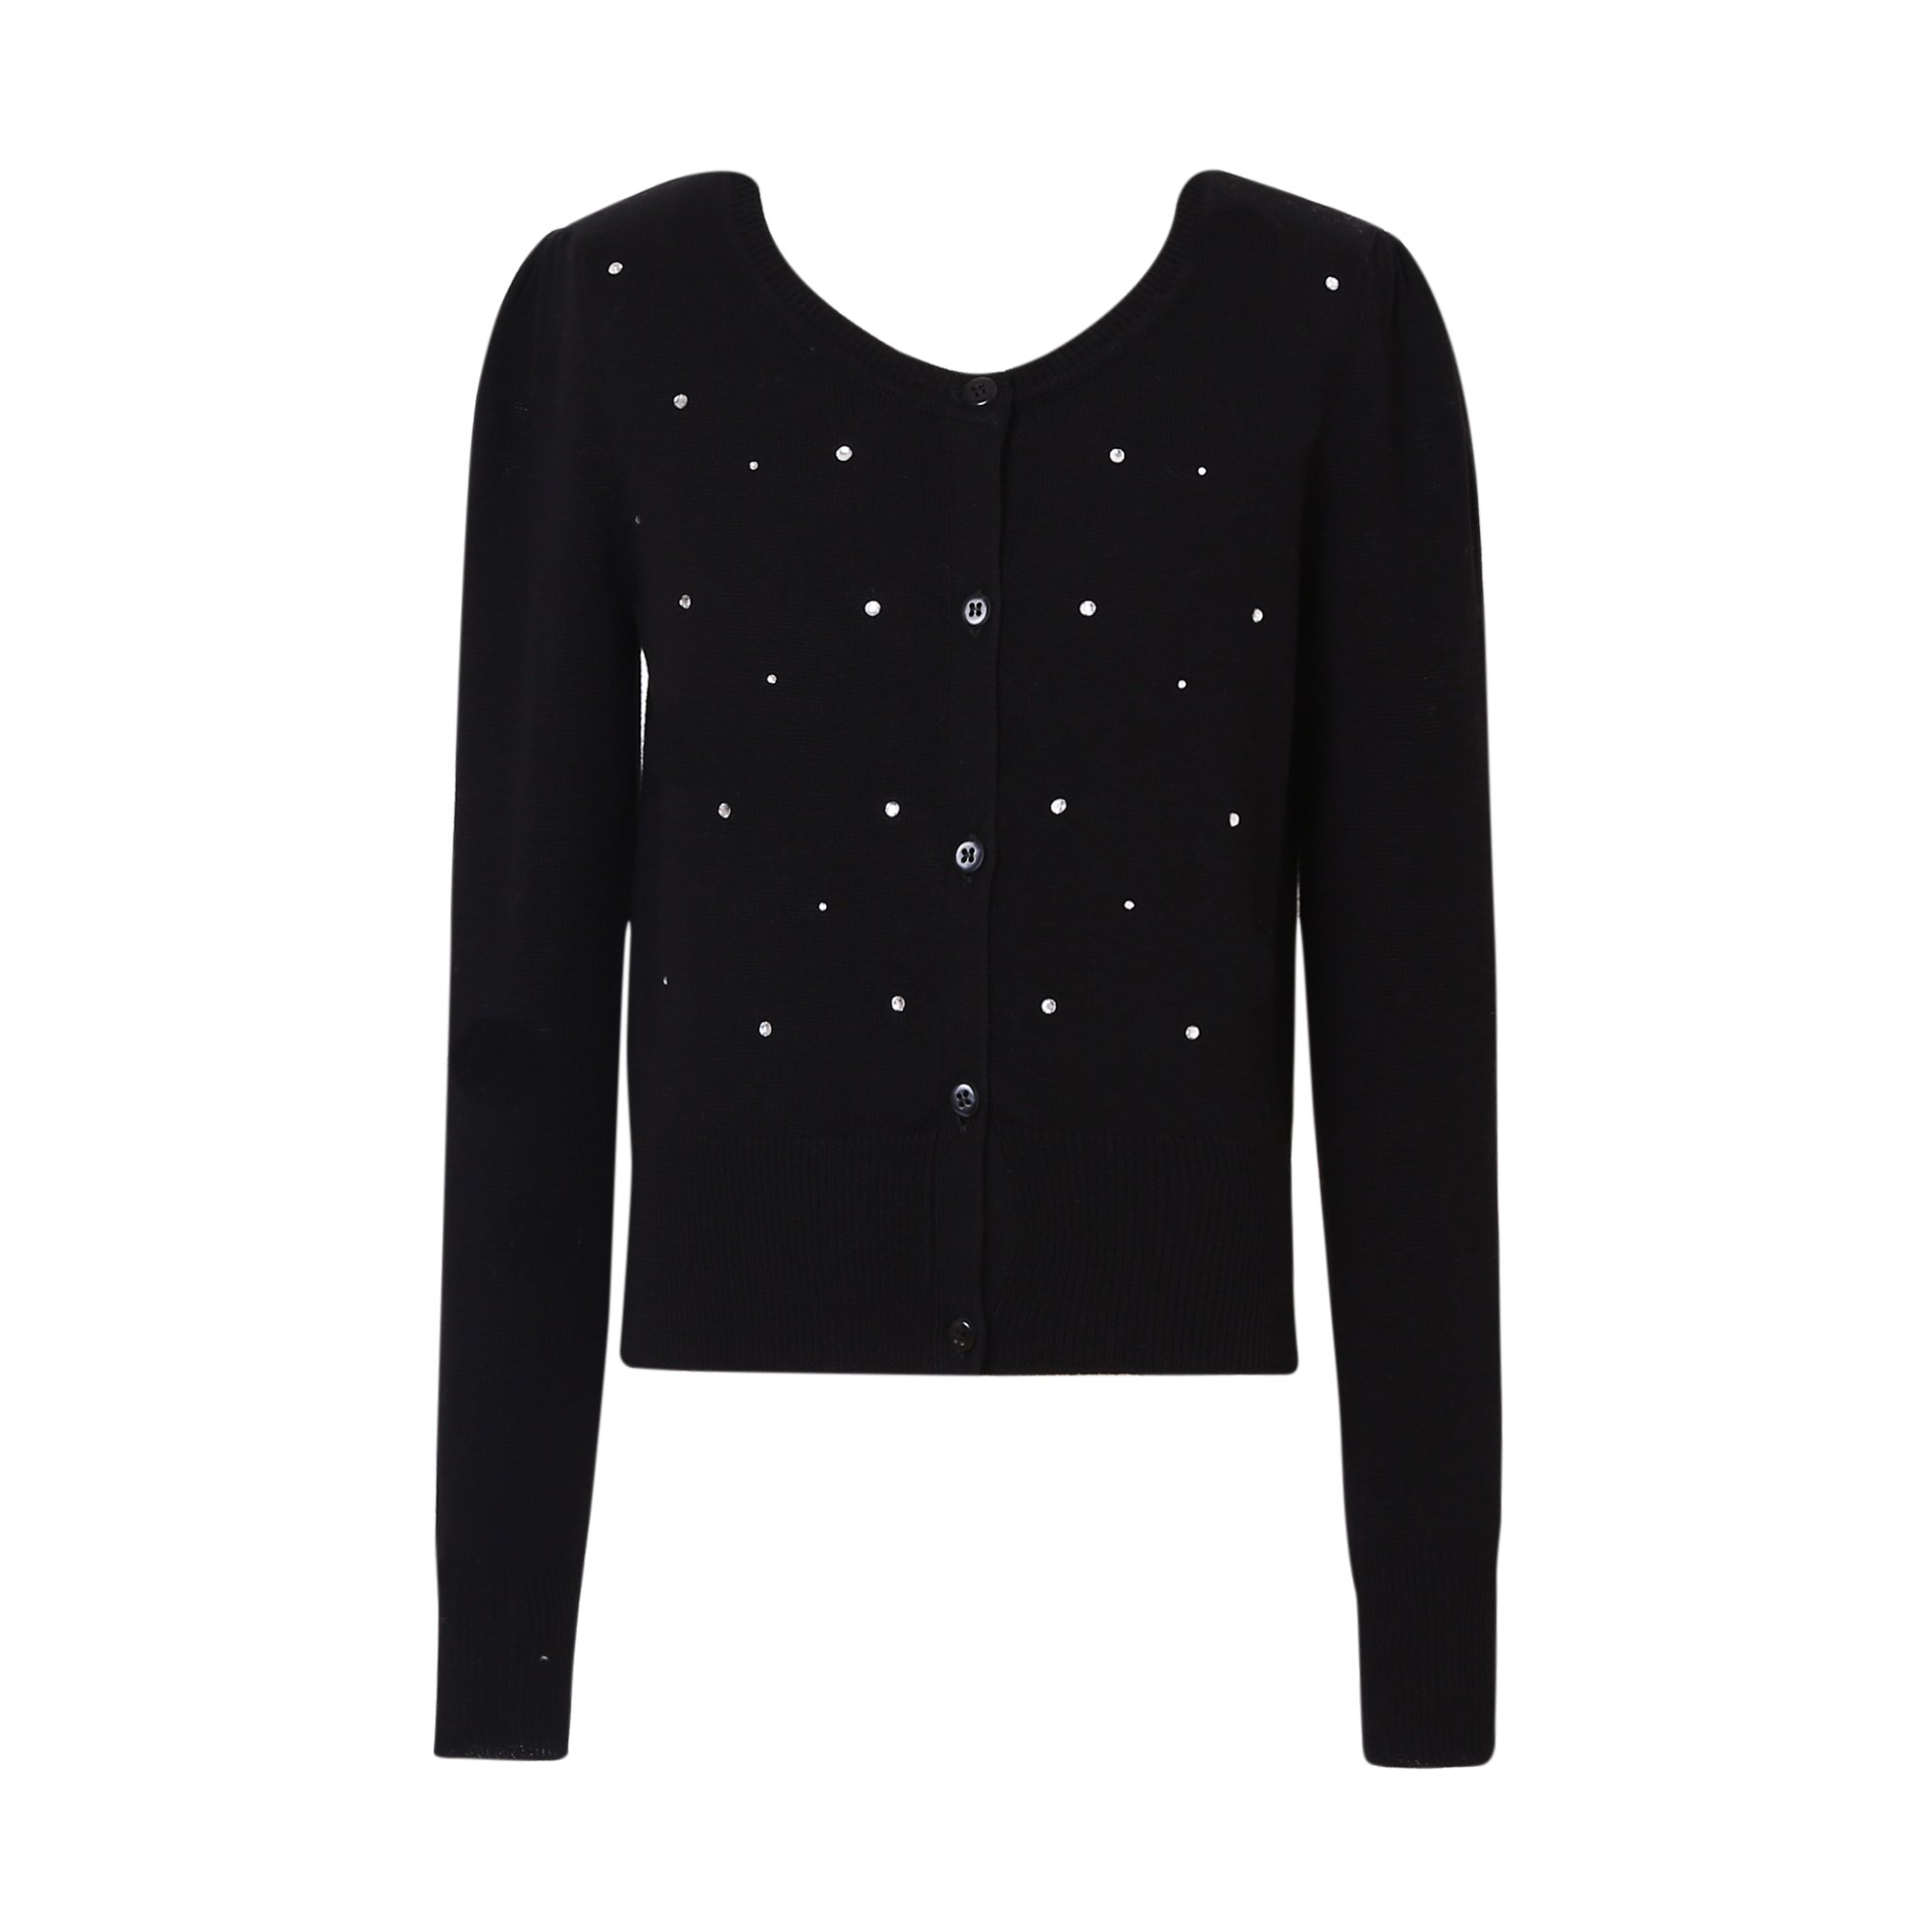 Richie House Big Girls' Sweater Cardigan with Shiny Studs RH1016-H-9/10